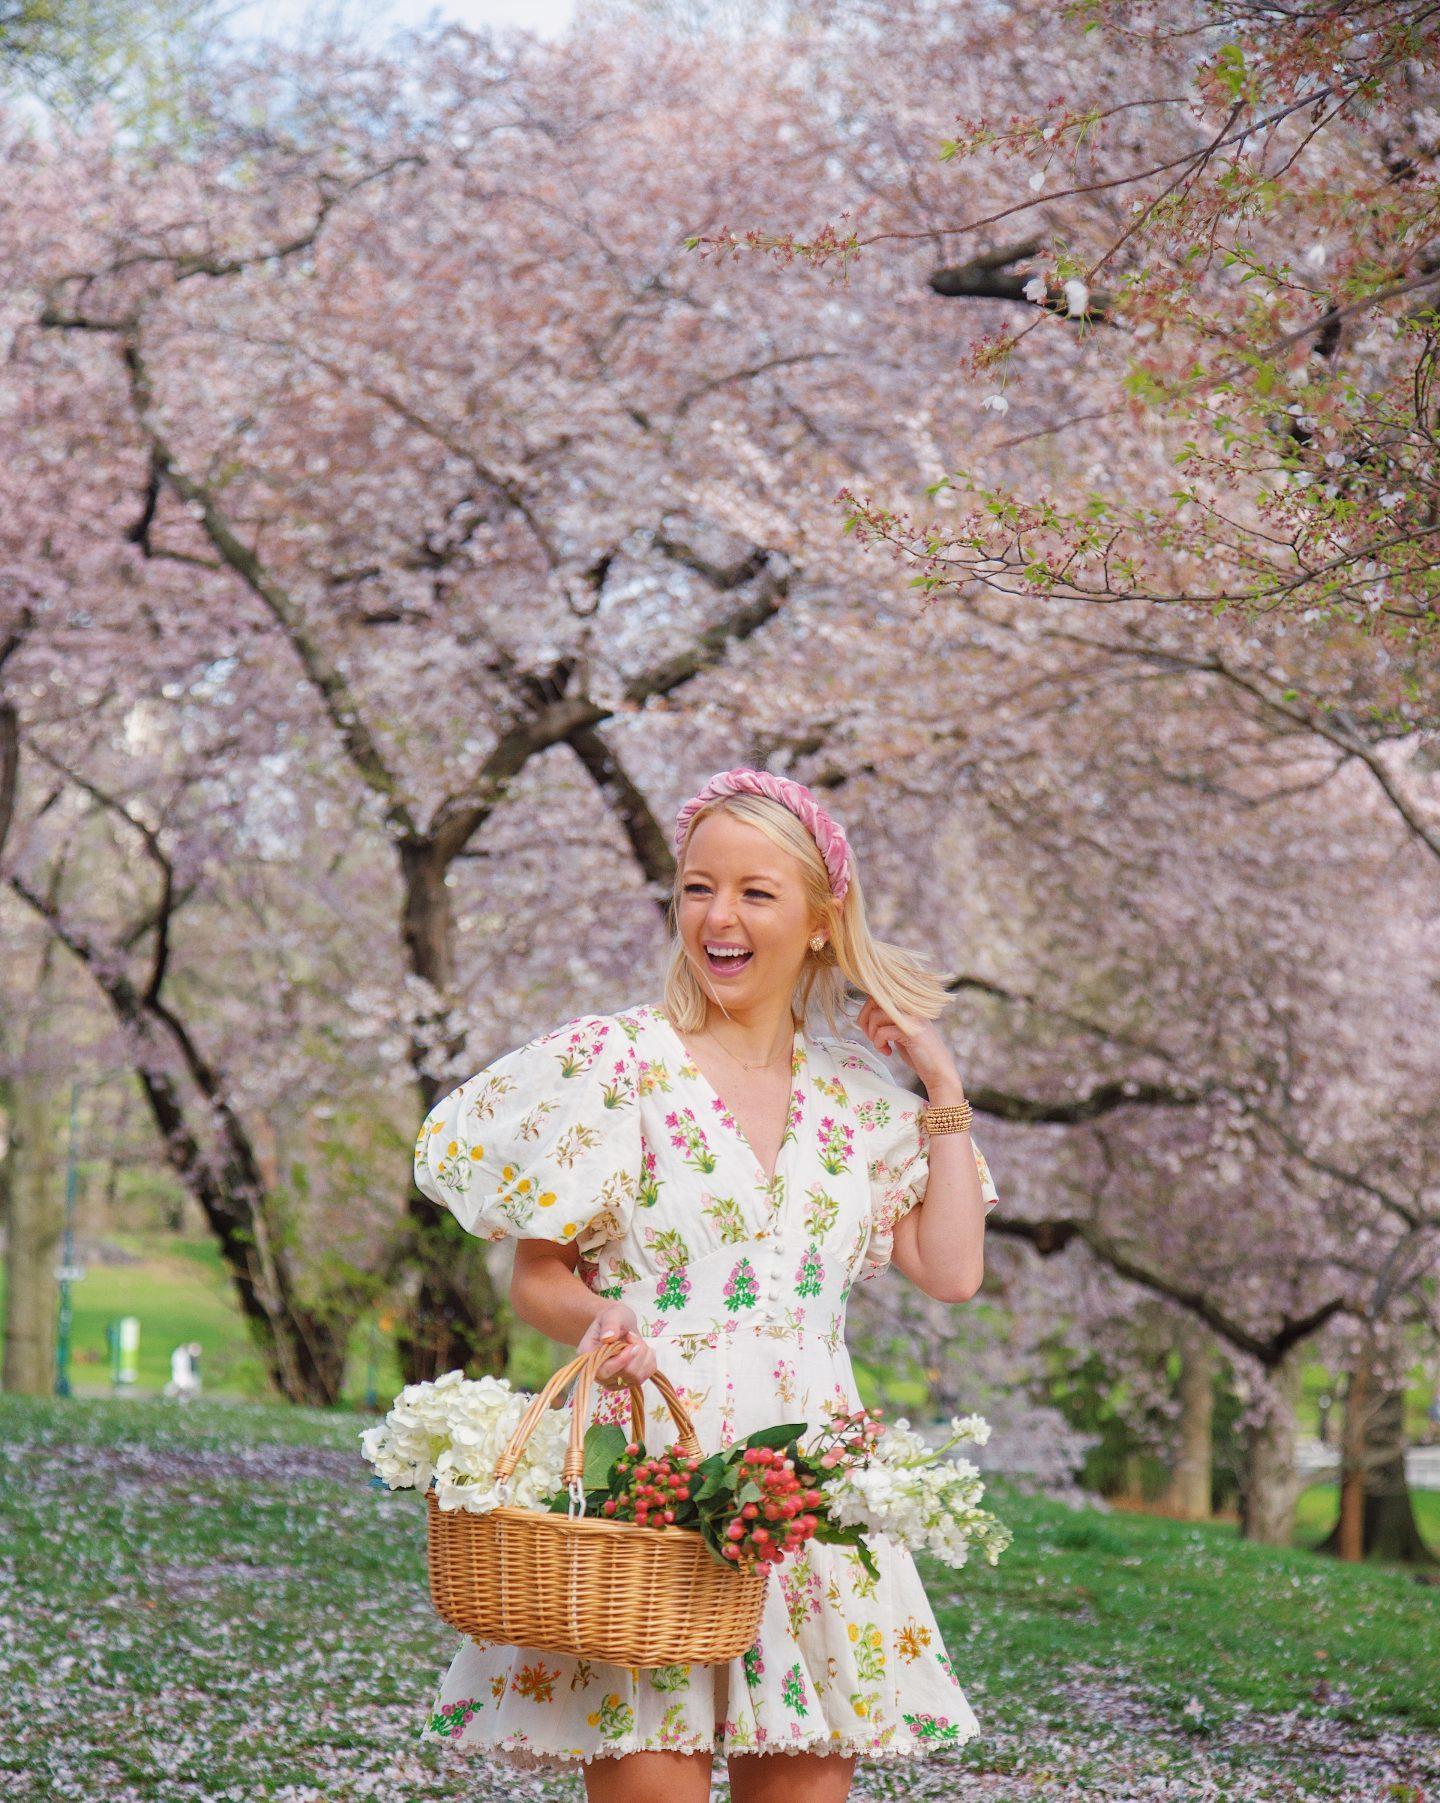 Amazon wicker picnic basket